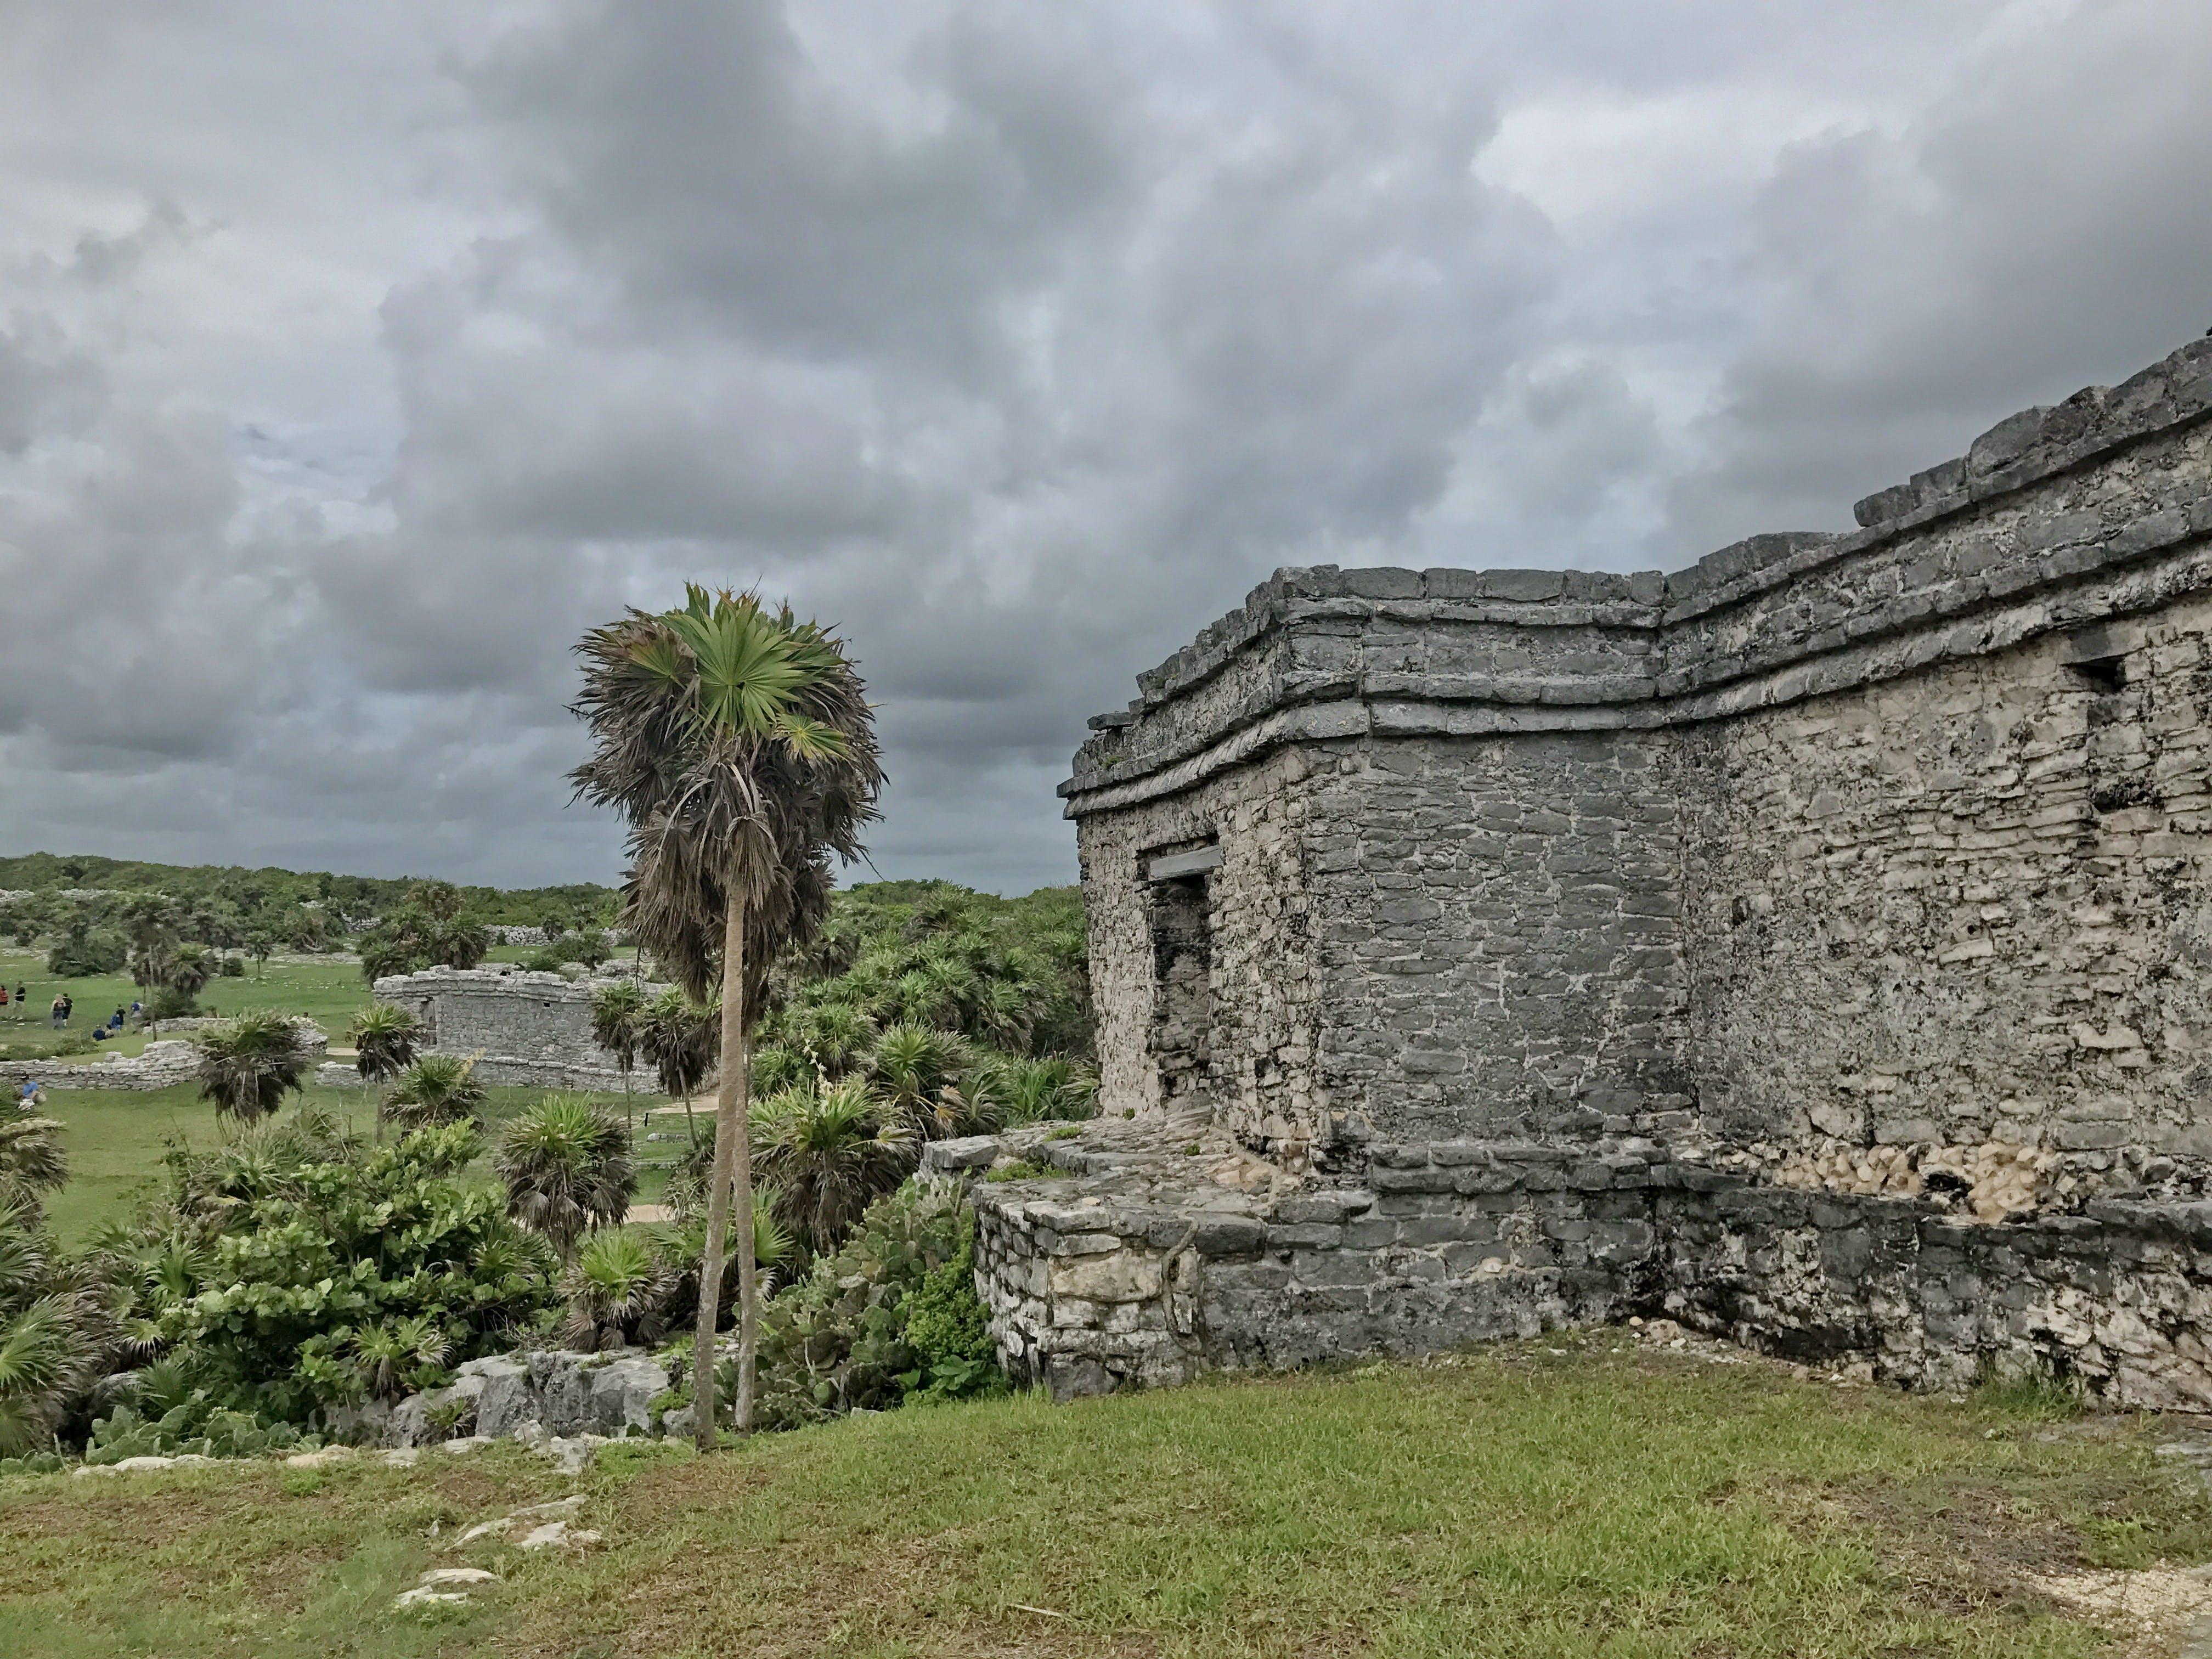 Free stock photo of ruins, palm tree, El Castillo, Mayan